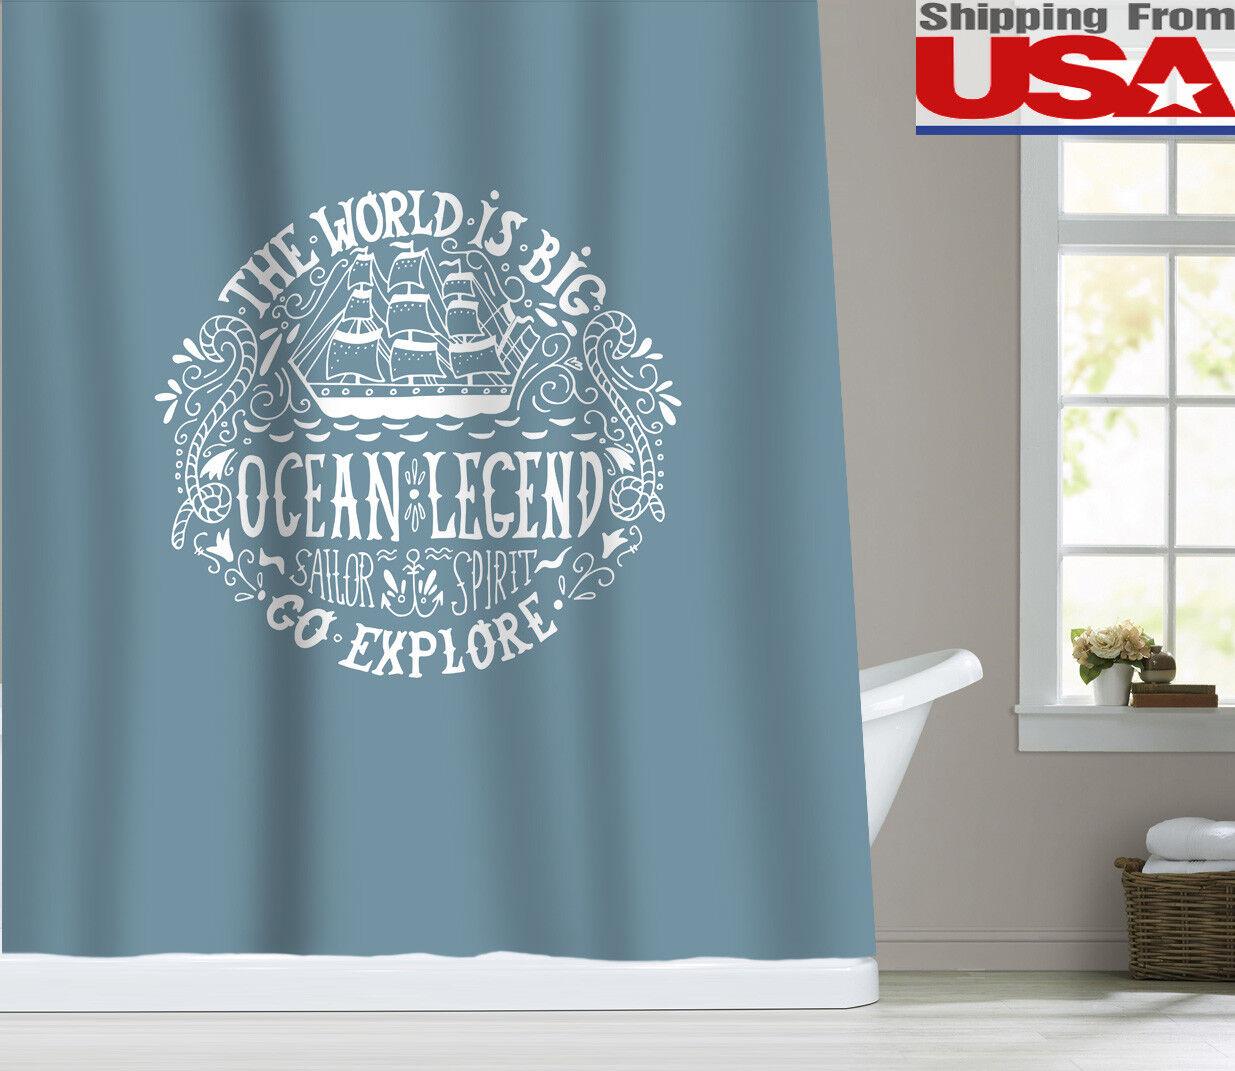 Nautical Sailor Explore Fabric Shower Curtain Bathroom Decor Ocean Pale Blue 72